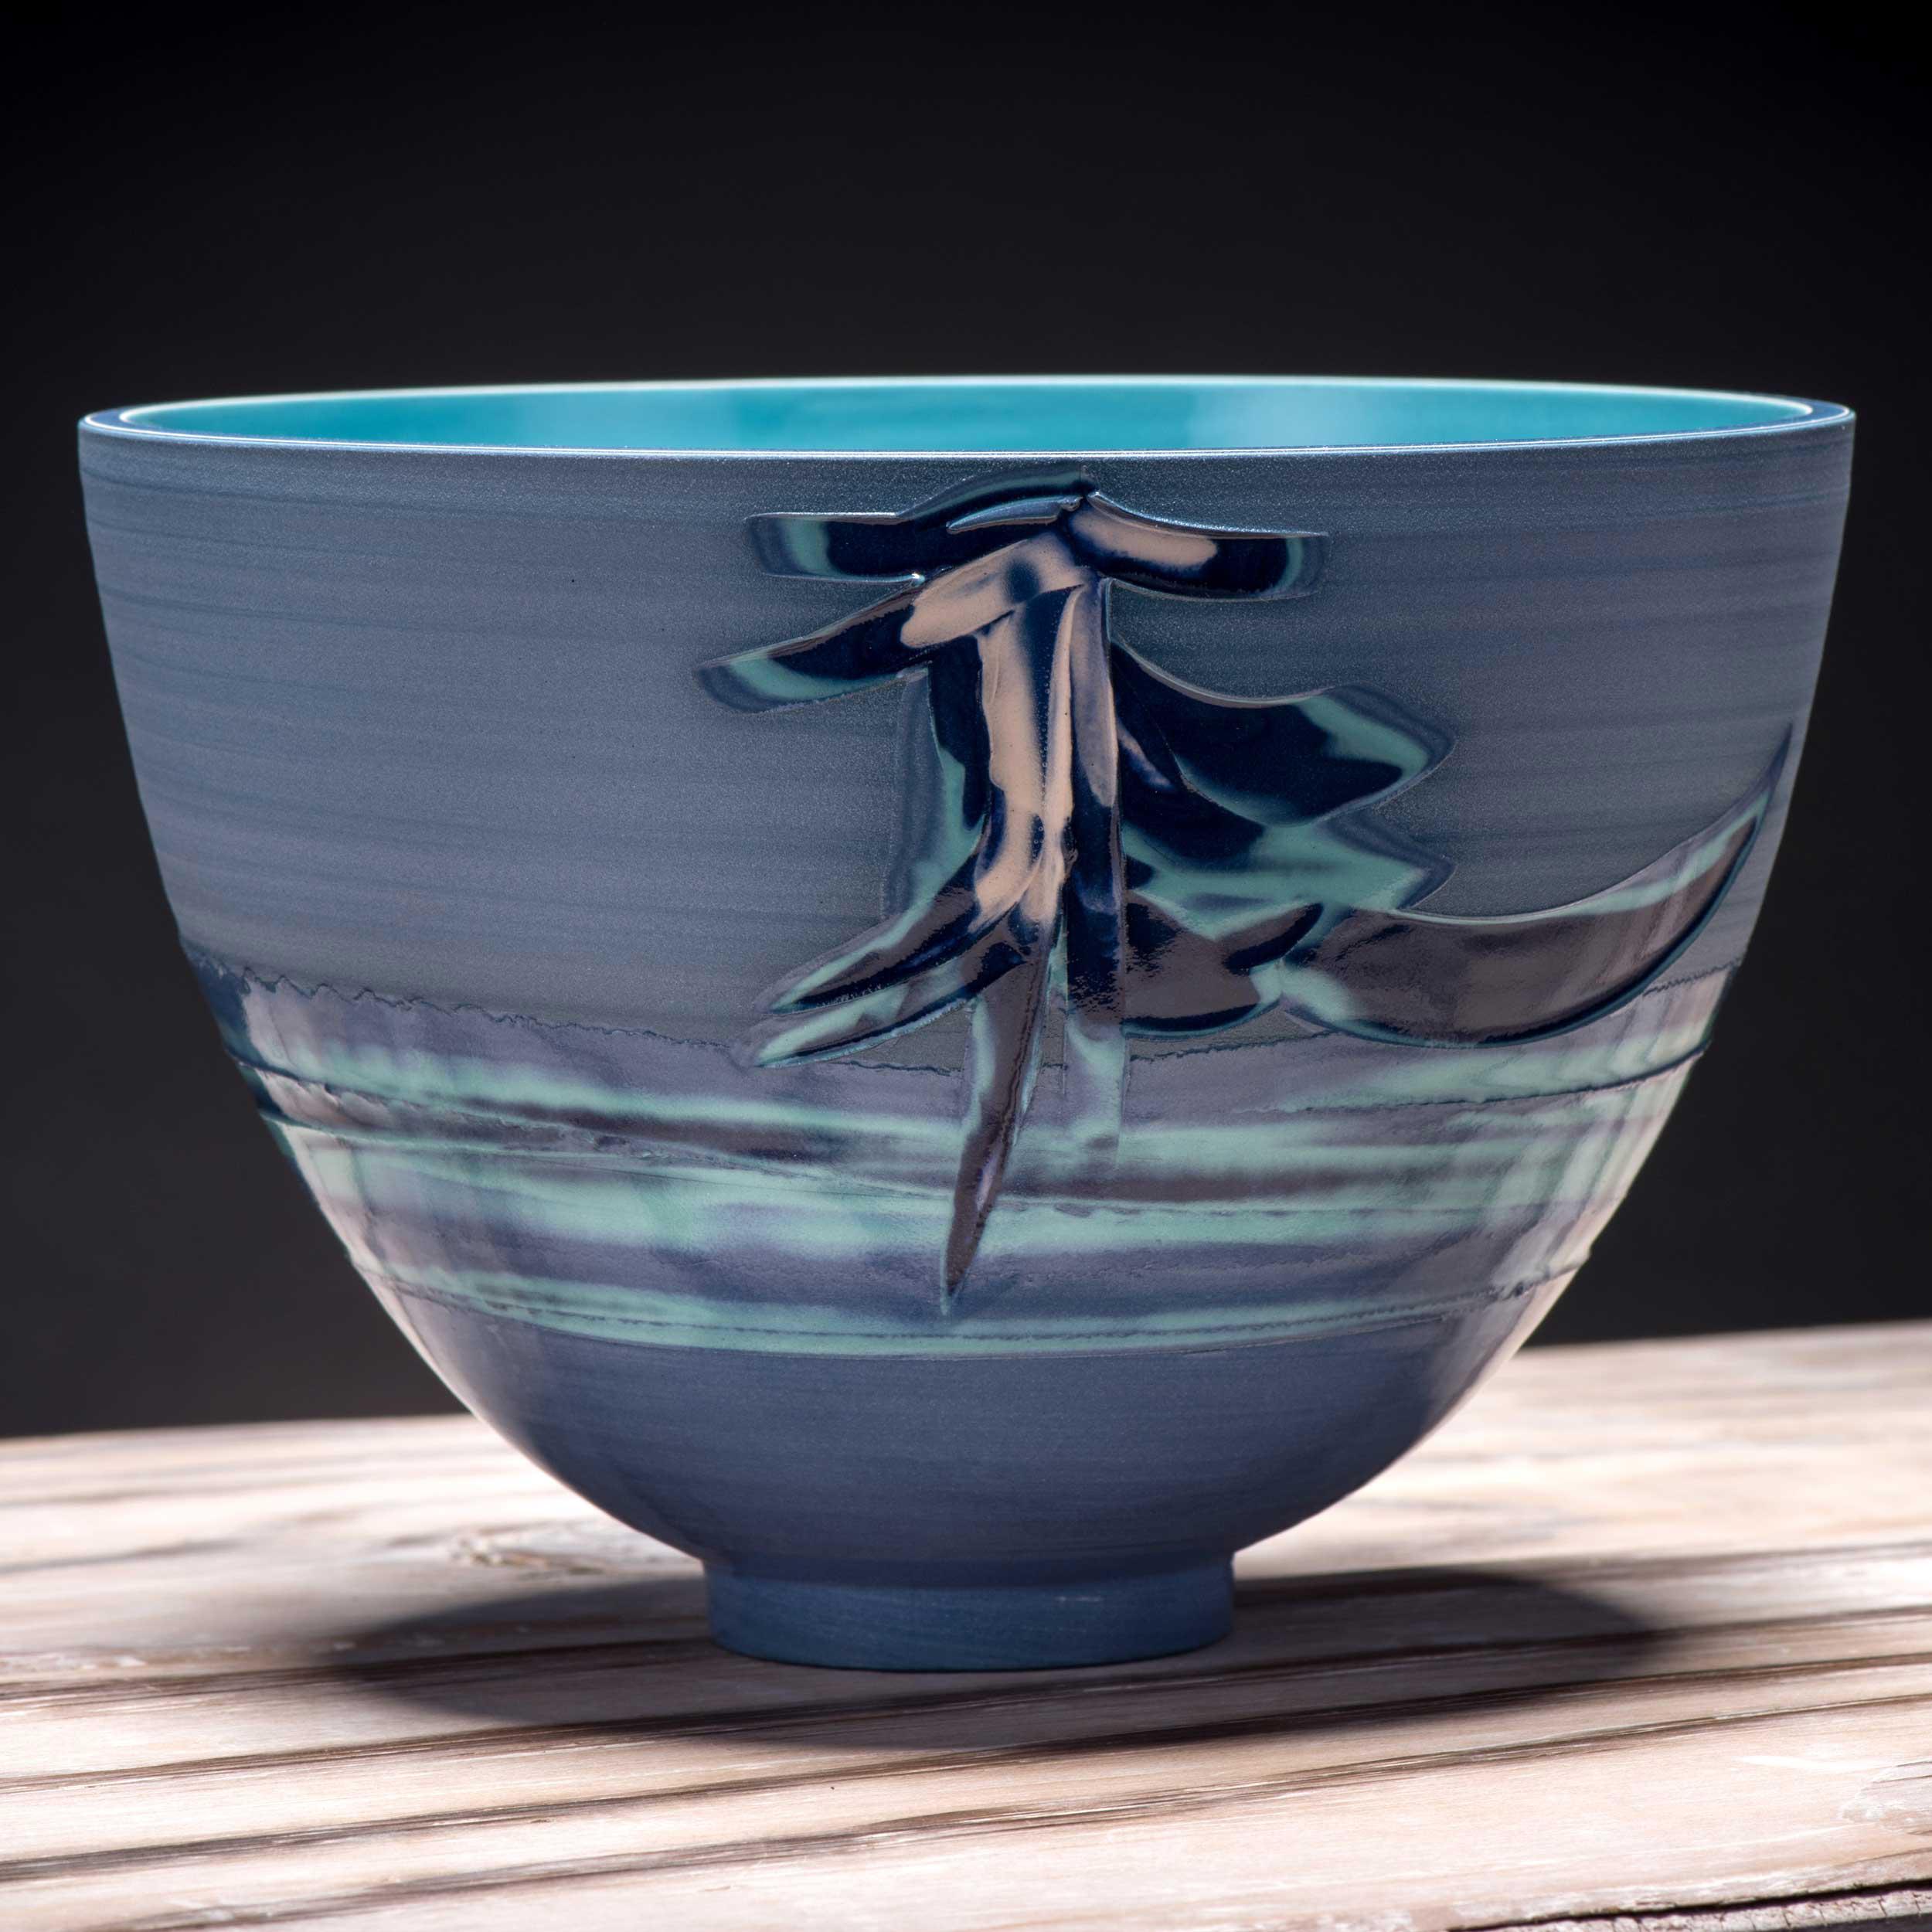 Japanese Style Waterfall Ceramic Bowl by Rowena Gilbert Coast Se